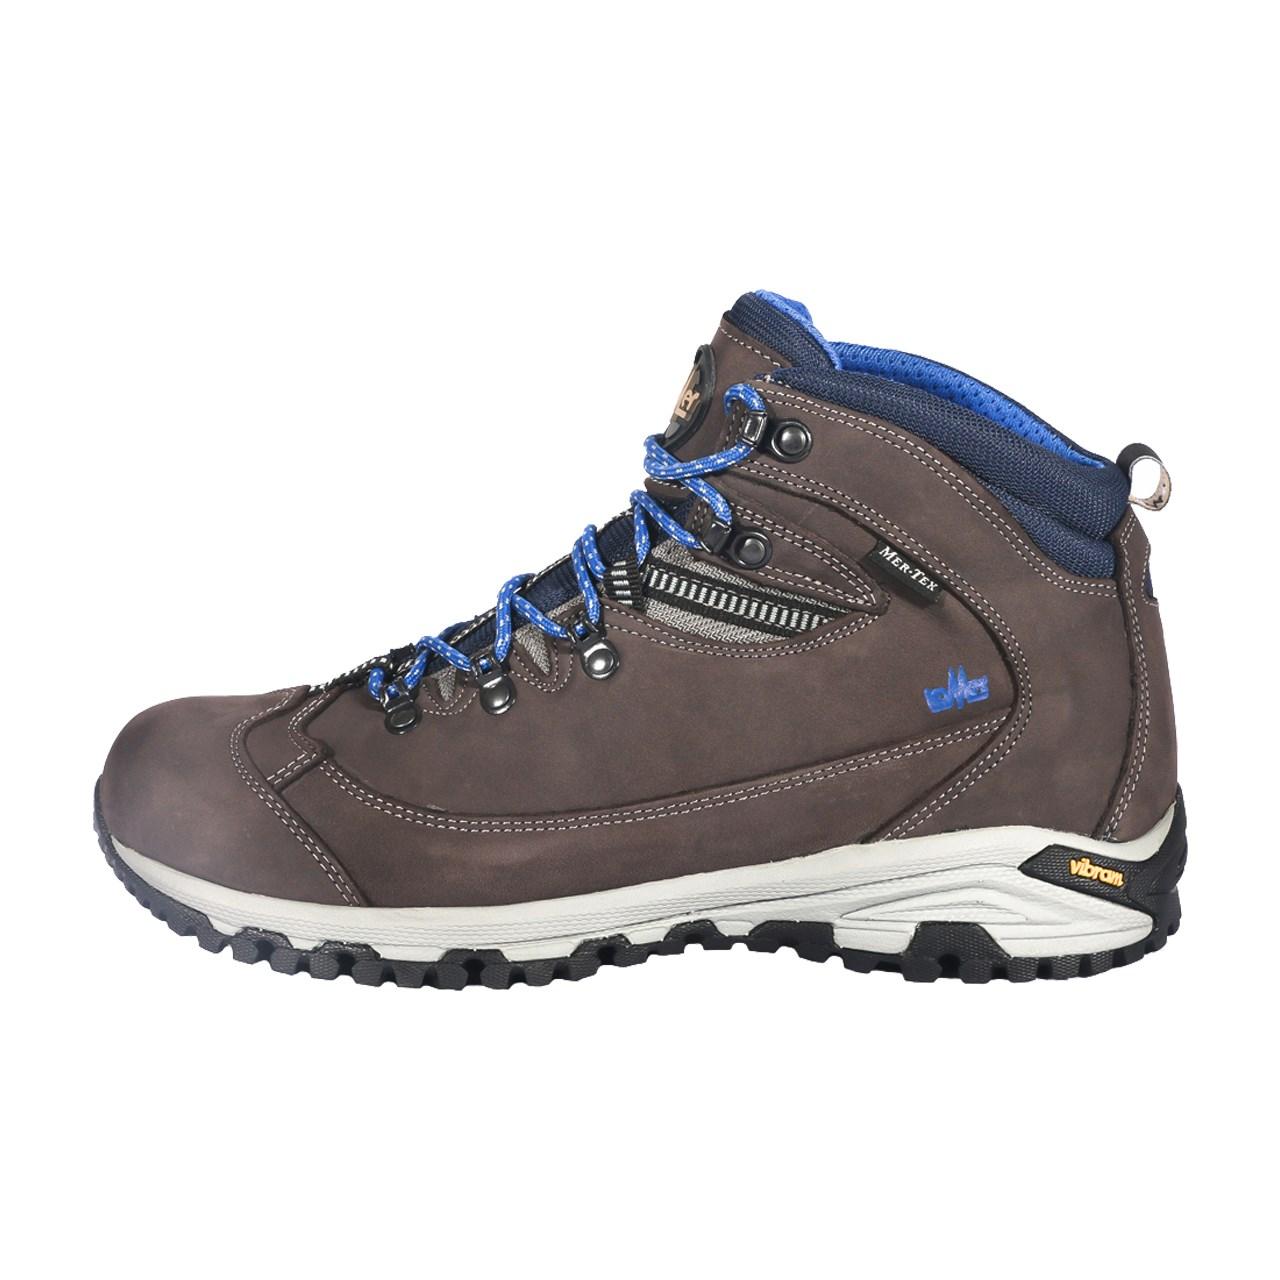 کفش کوهنوردی لومر مدل cristallo nubuck mtx antra/navy